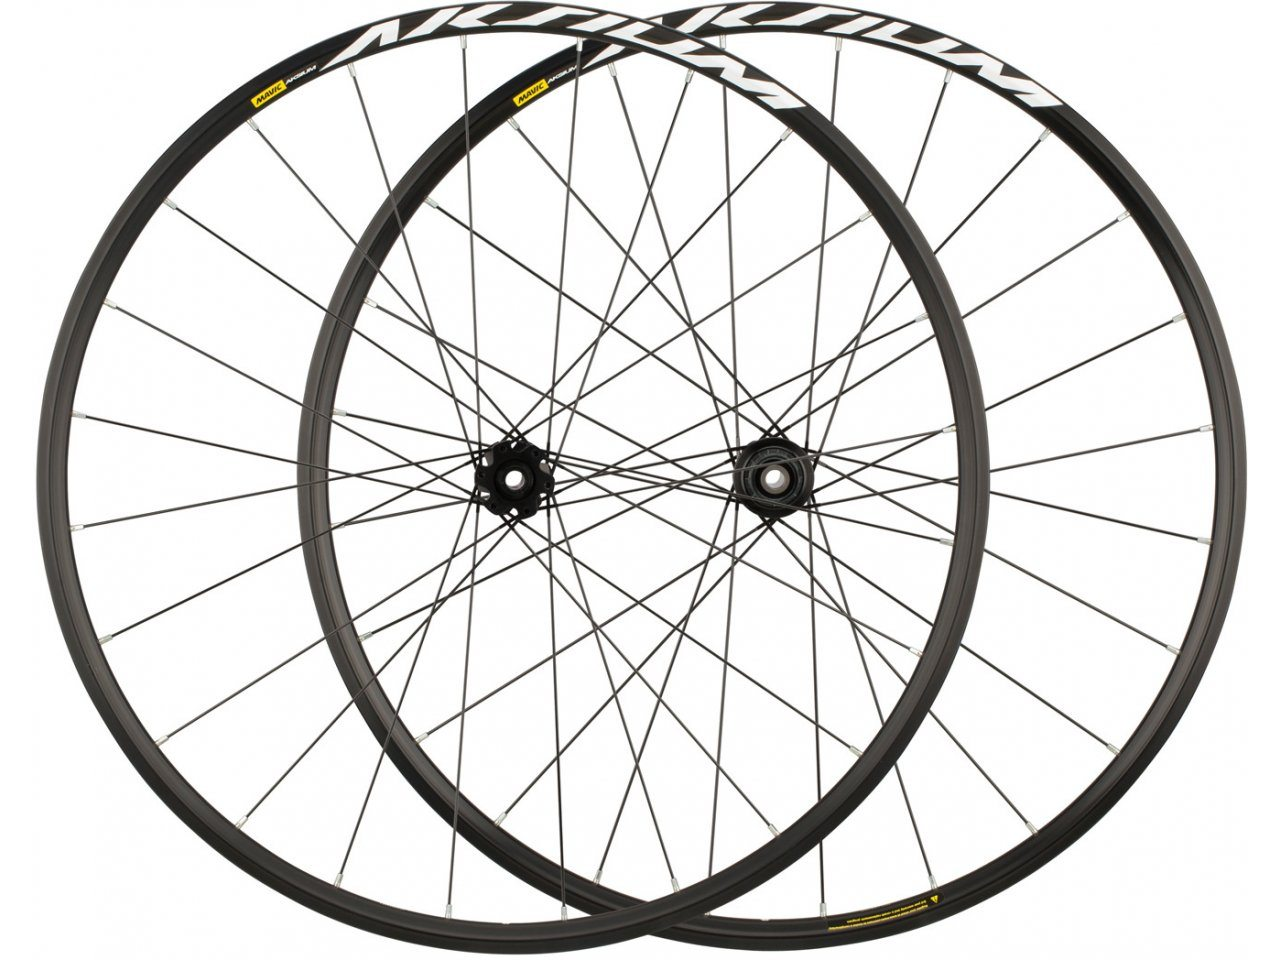 Aksium-Disc-6-bolt-Wheelset-black-28-set-front-12×100-rear-12×142-Shimano-66675-324627-1585071151